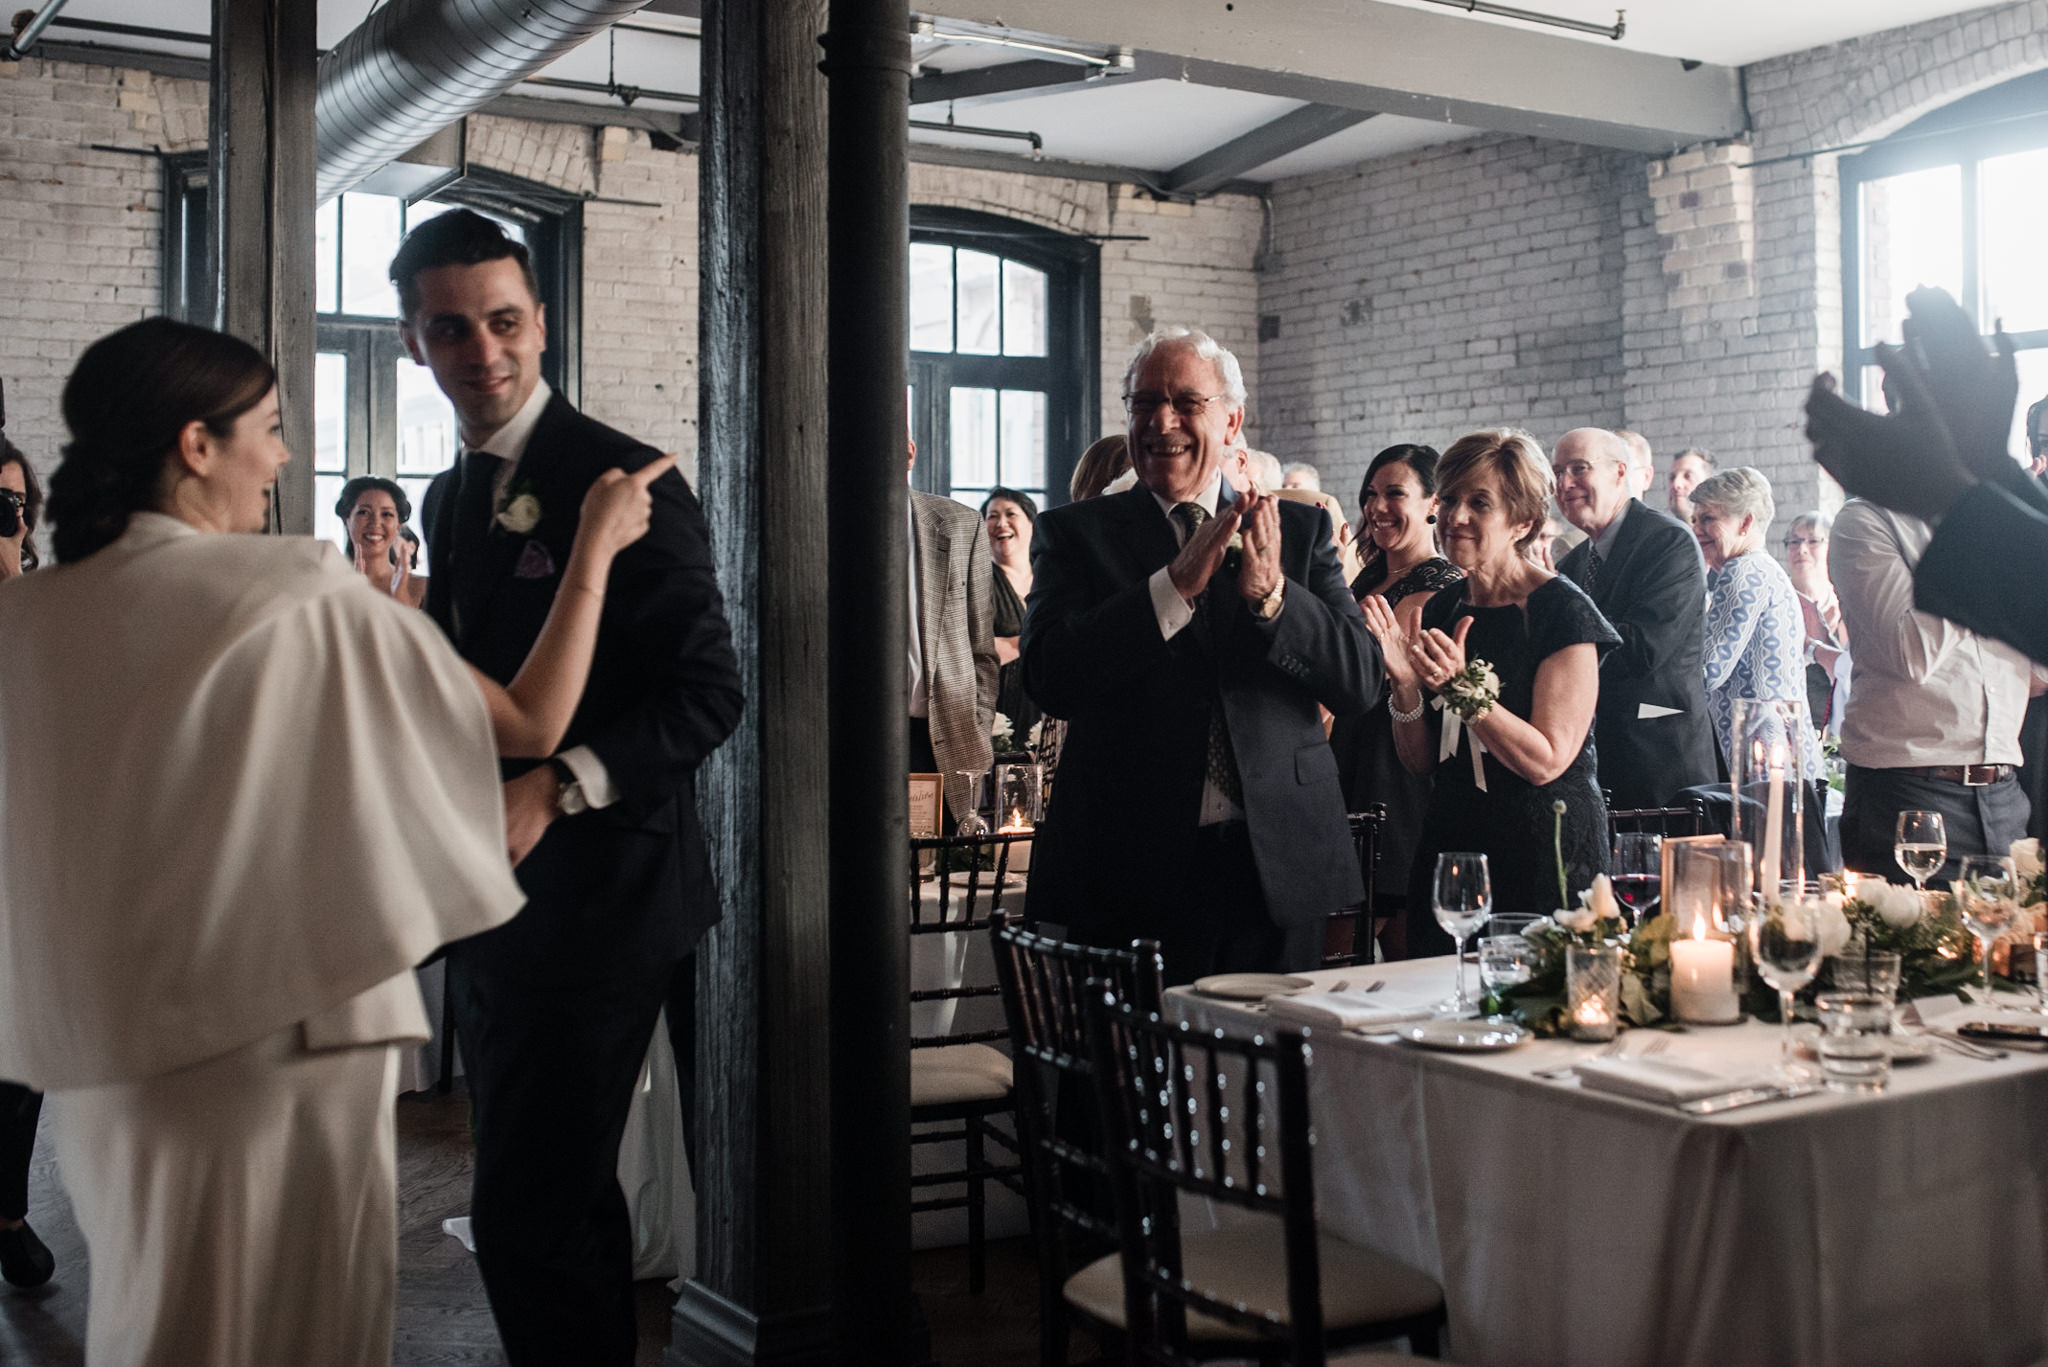 080-guests-candids-documentary-wedding-photographer-reception-storys-toronto.jpg